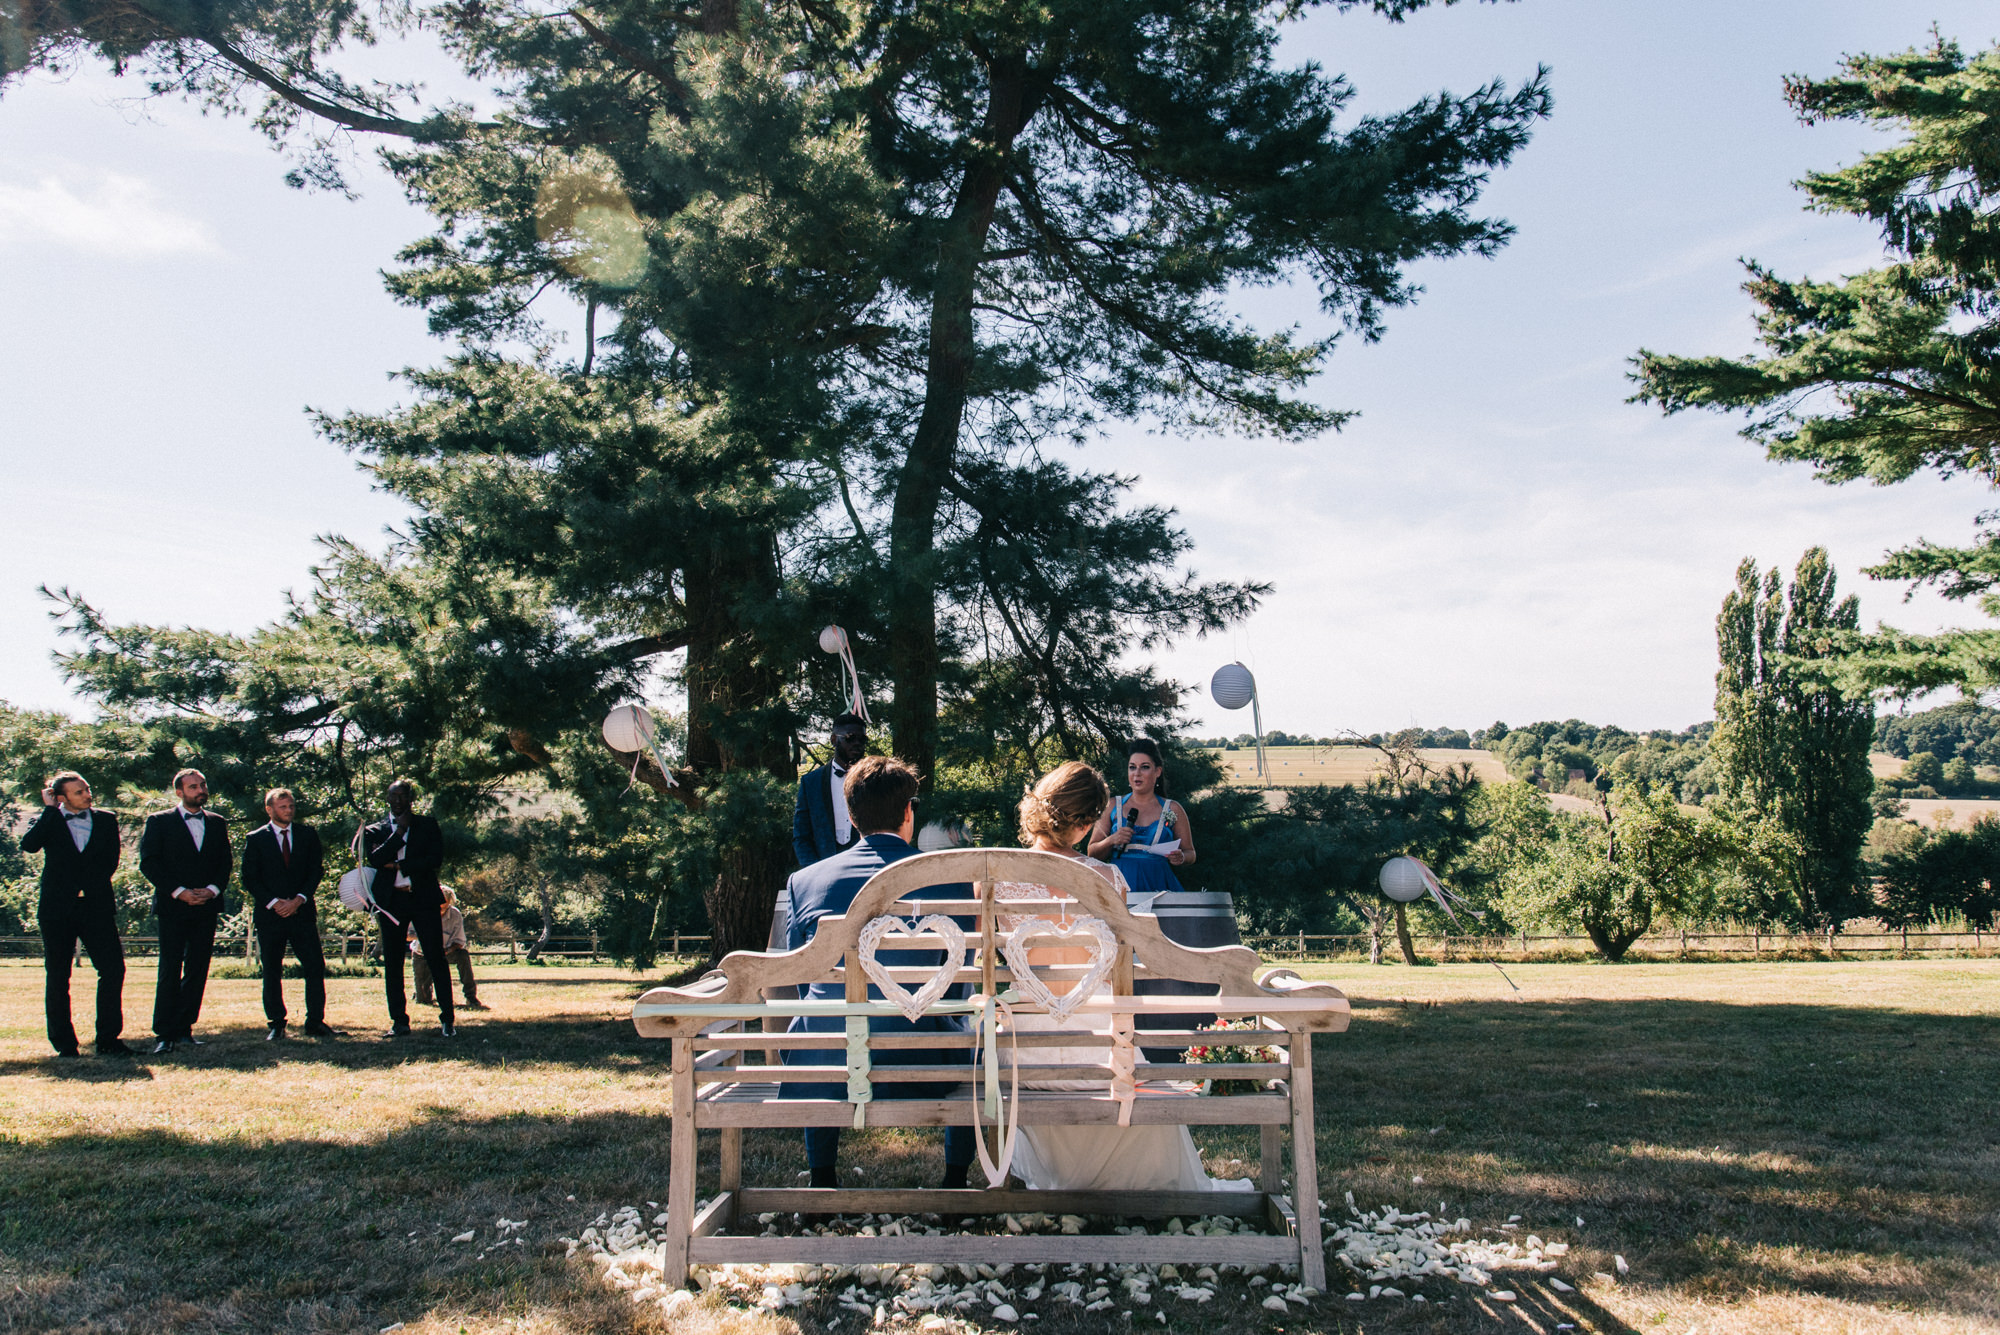 photographe-mariage-paris-nantes-provence-angers-29-2